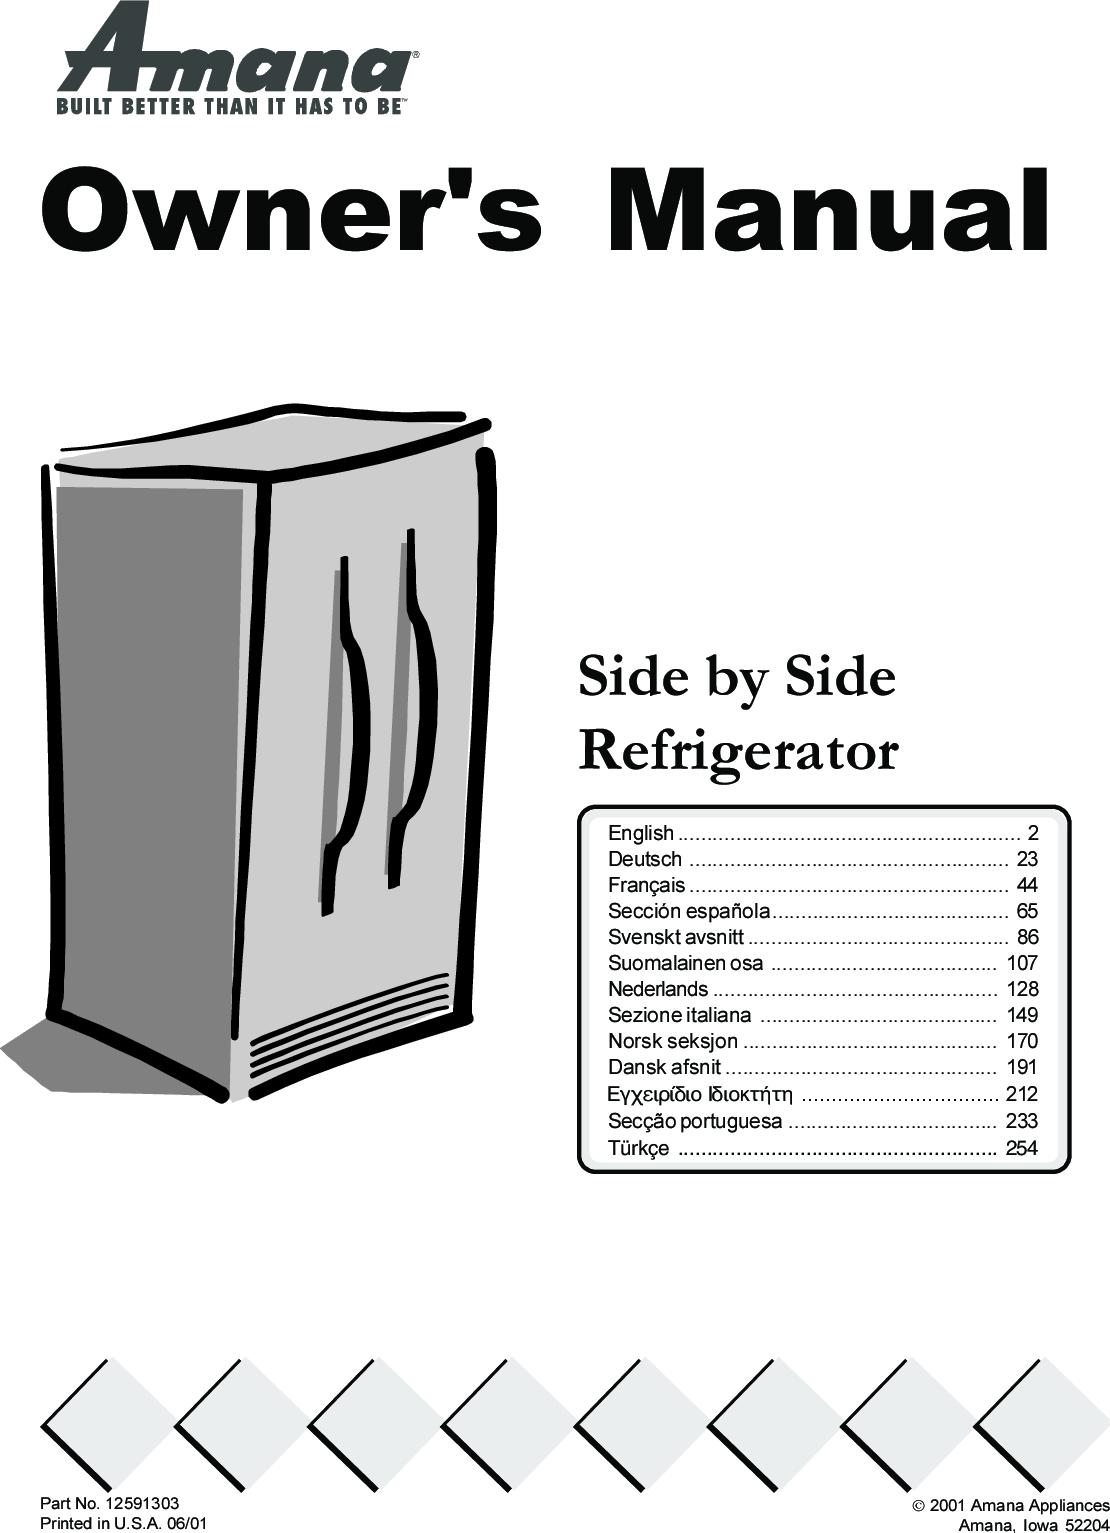 5eb48a41978 Amana XRSS287BB 303eng.p65 User Manual To The 999b9d11 40bd 4e2c ac42  723148028875